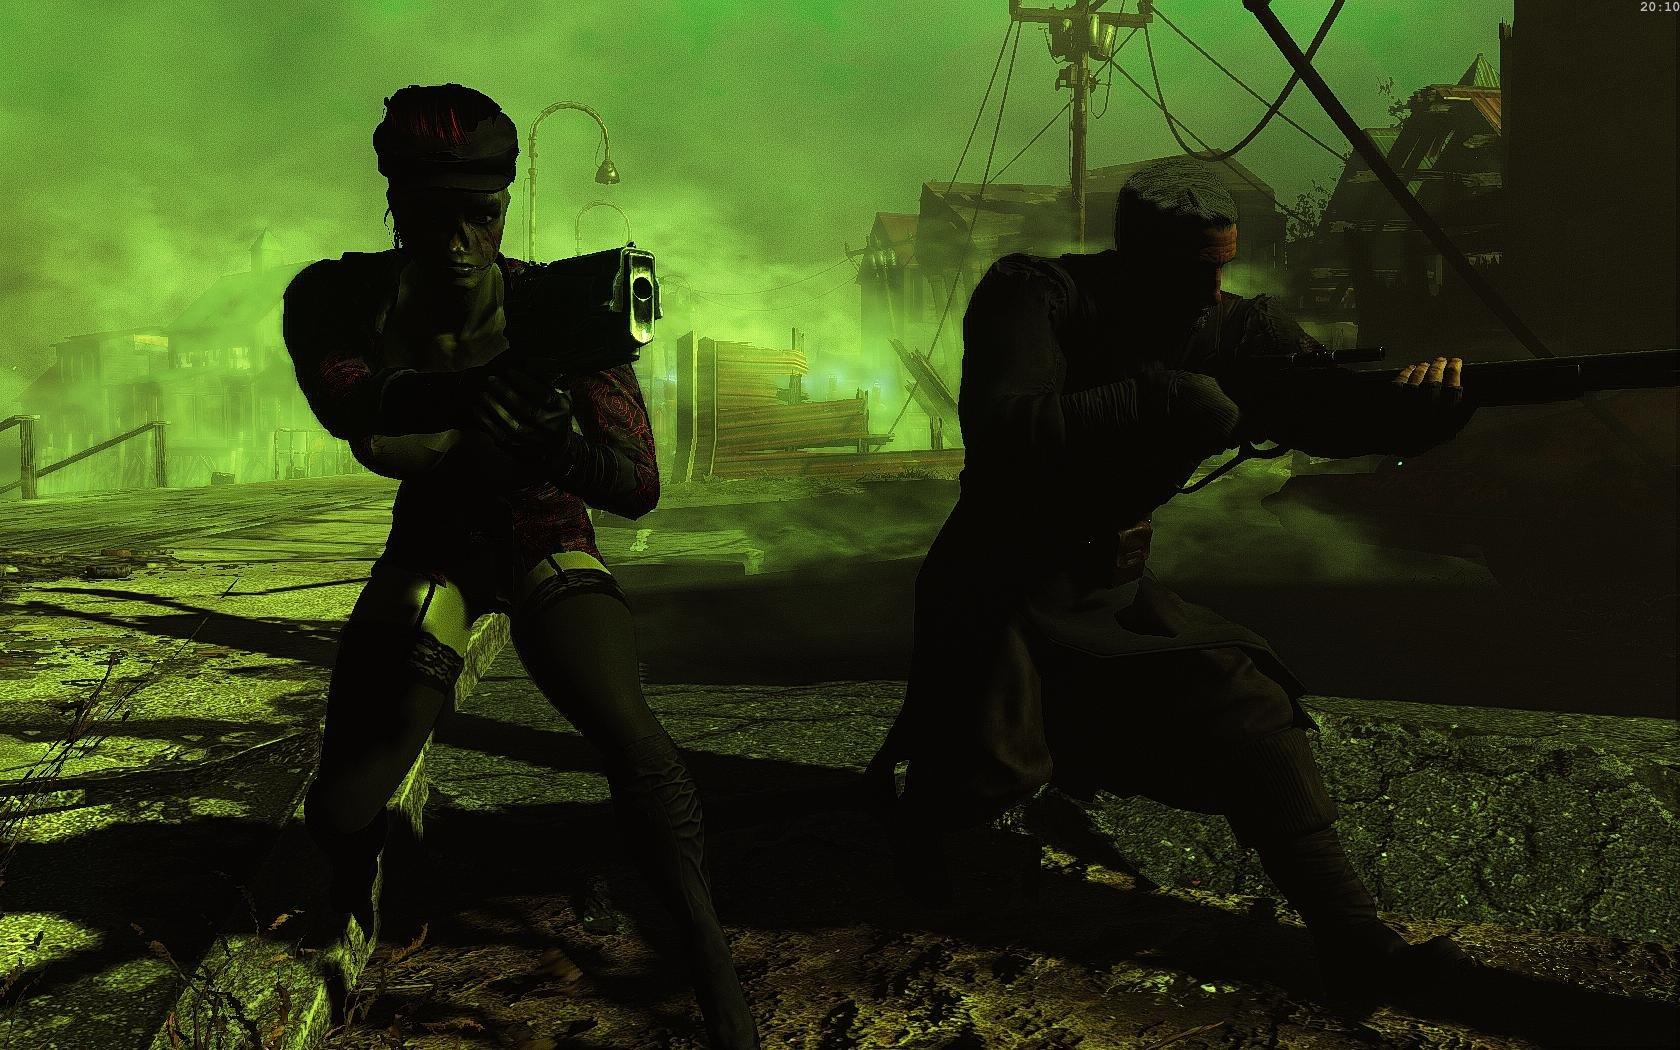 Fallout4 2019-05-30 20-10-44-99